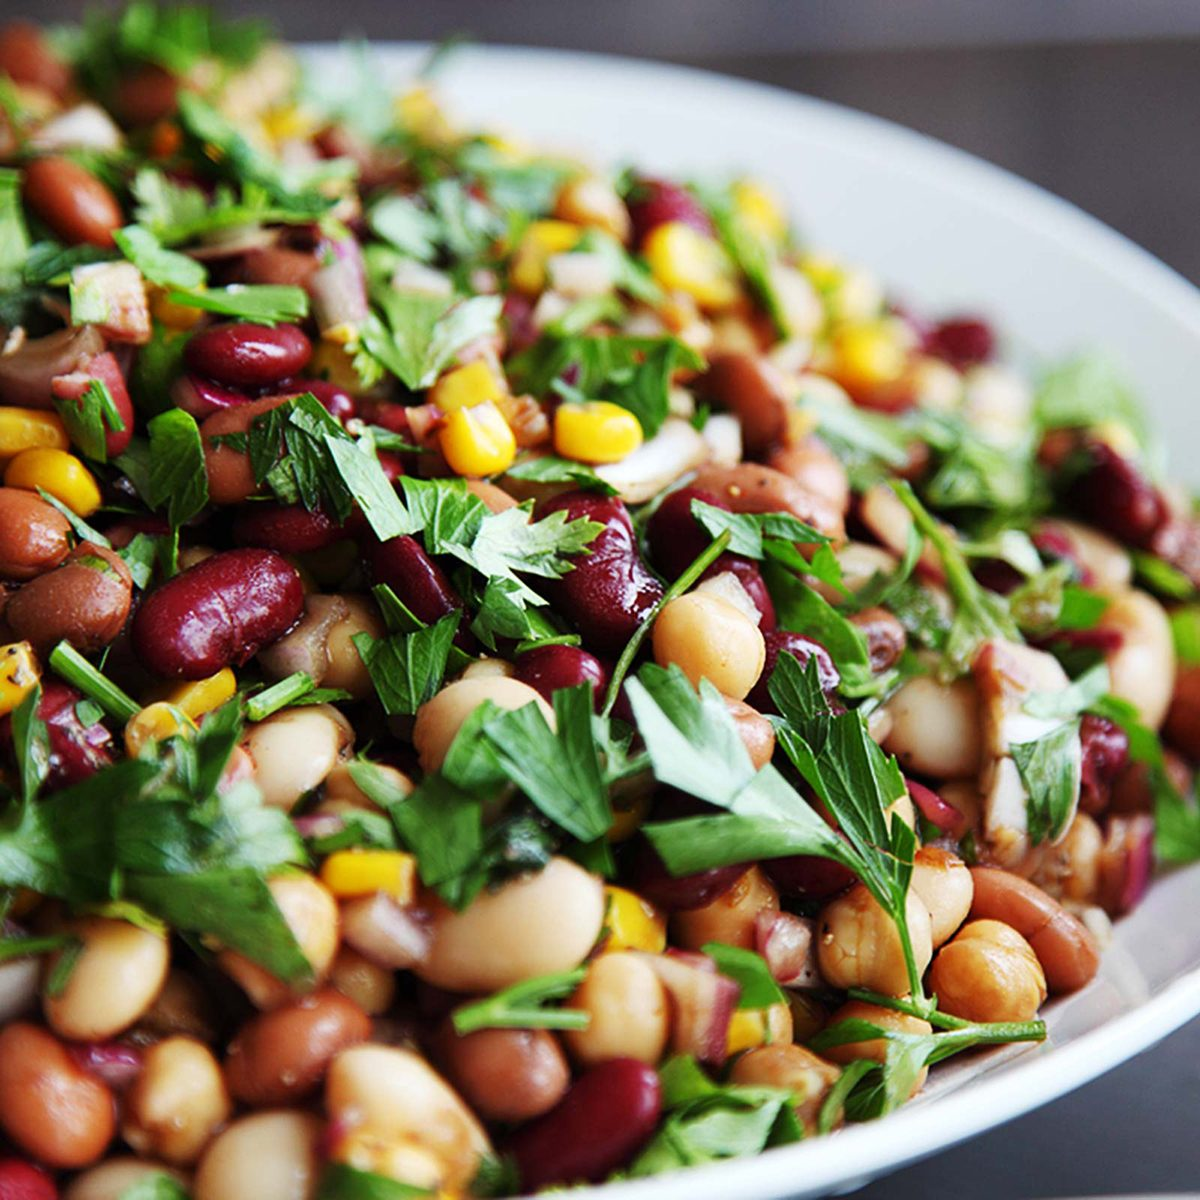 Chipotle bean dish